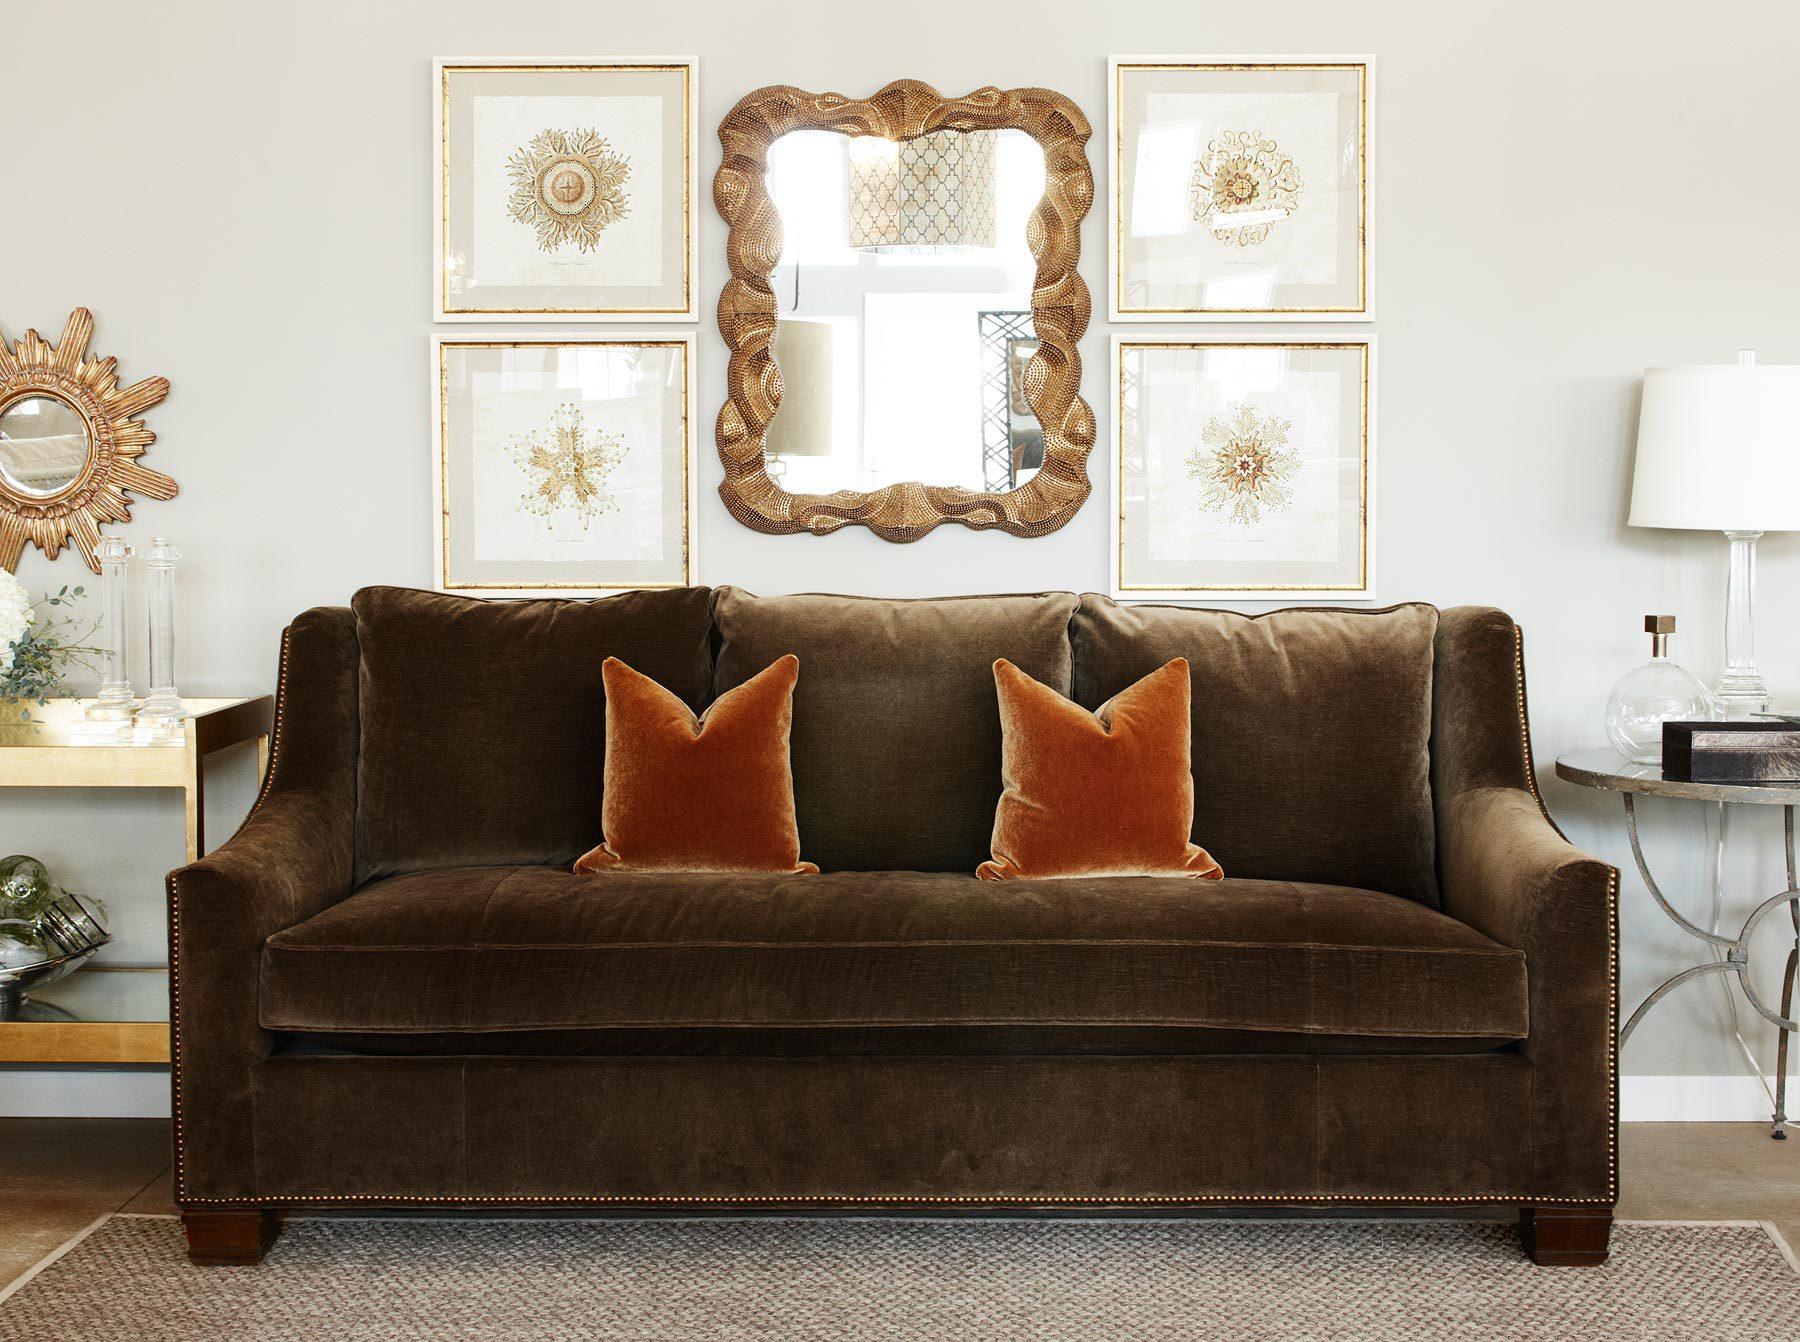 sutton sofa.jpeg